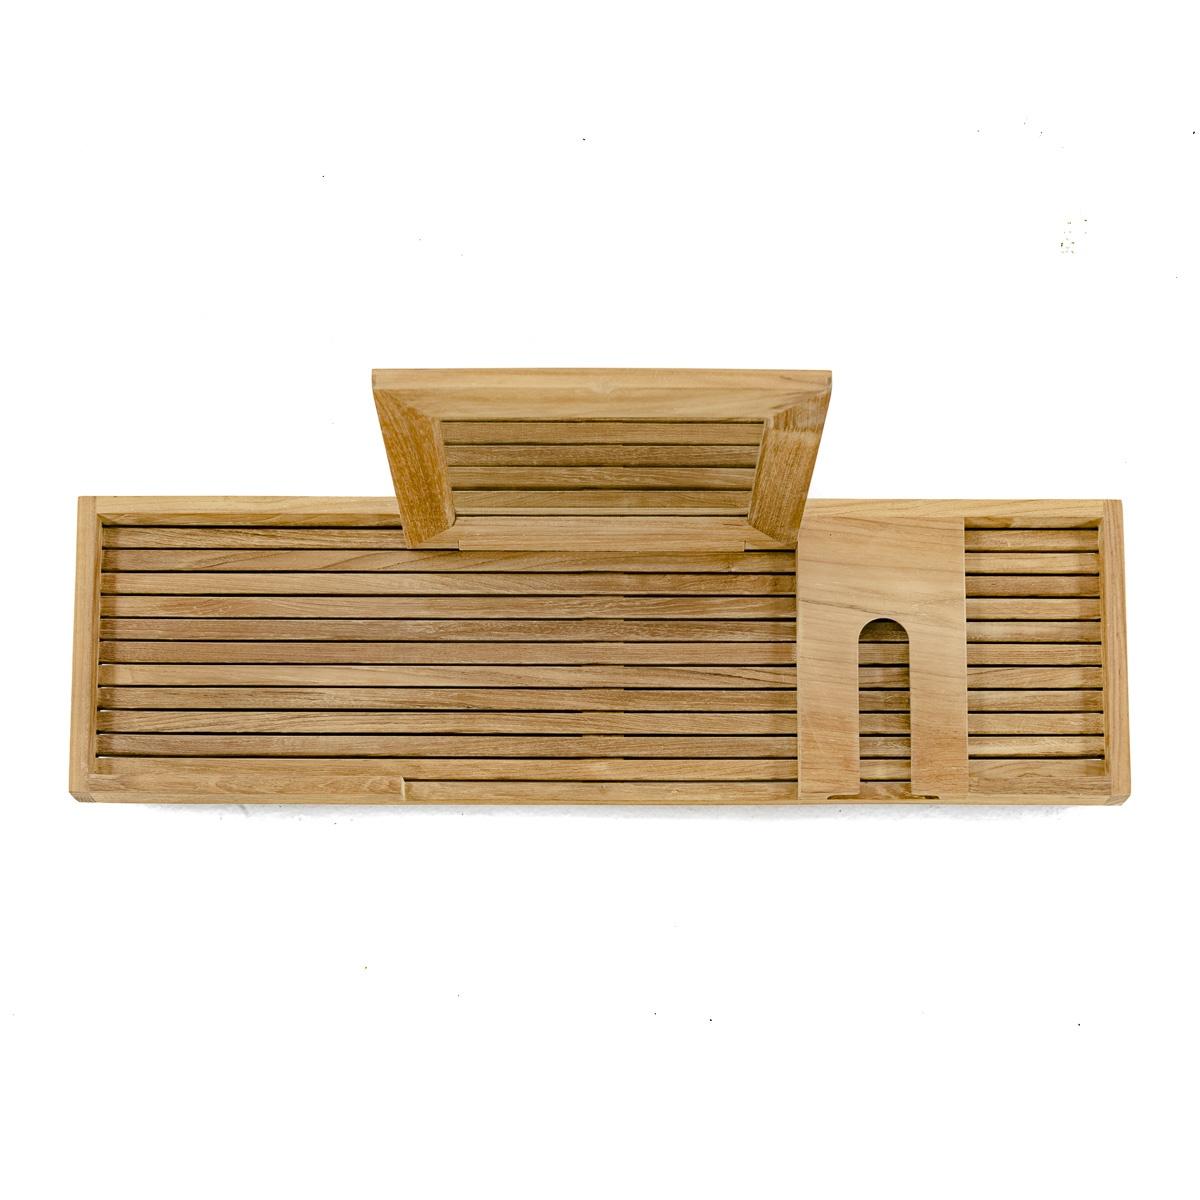 Teak Bathtub Tray Westminster Teak Outdoor Furniture : teak shower trays from www.westminsterteak.com size 1200 x 1200 jpeg 201kB